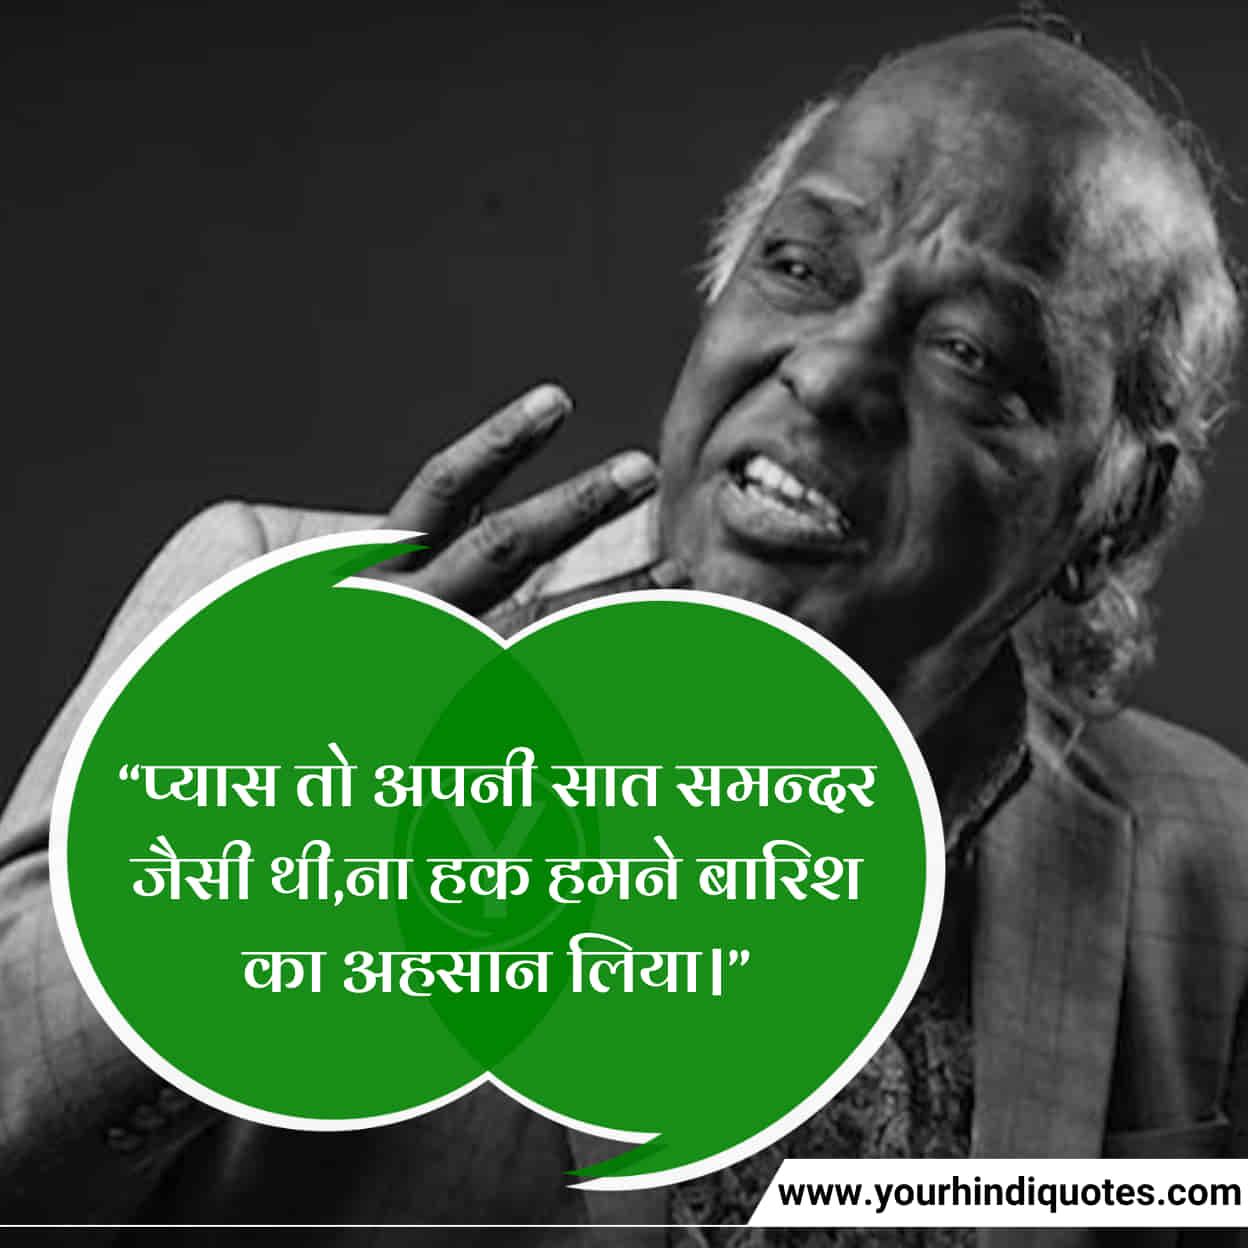 Best Rahat Indori Shayari on Life